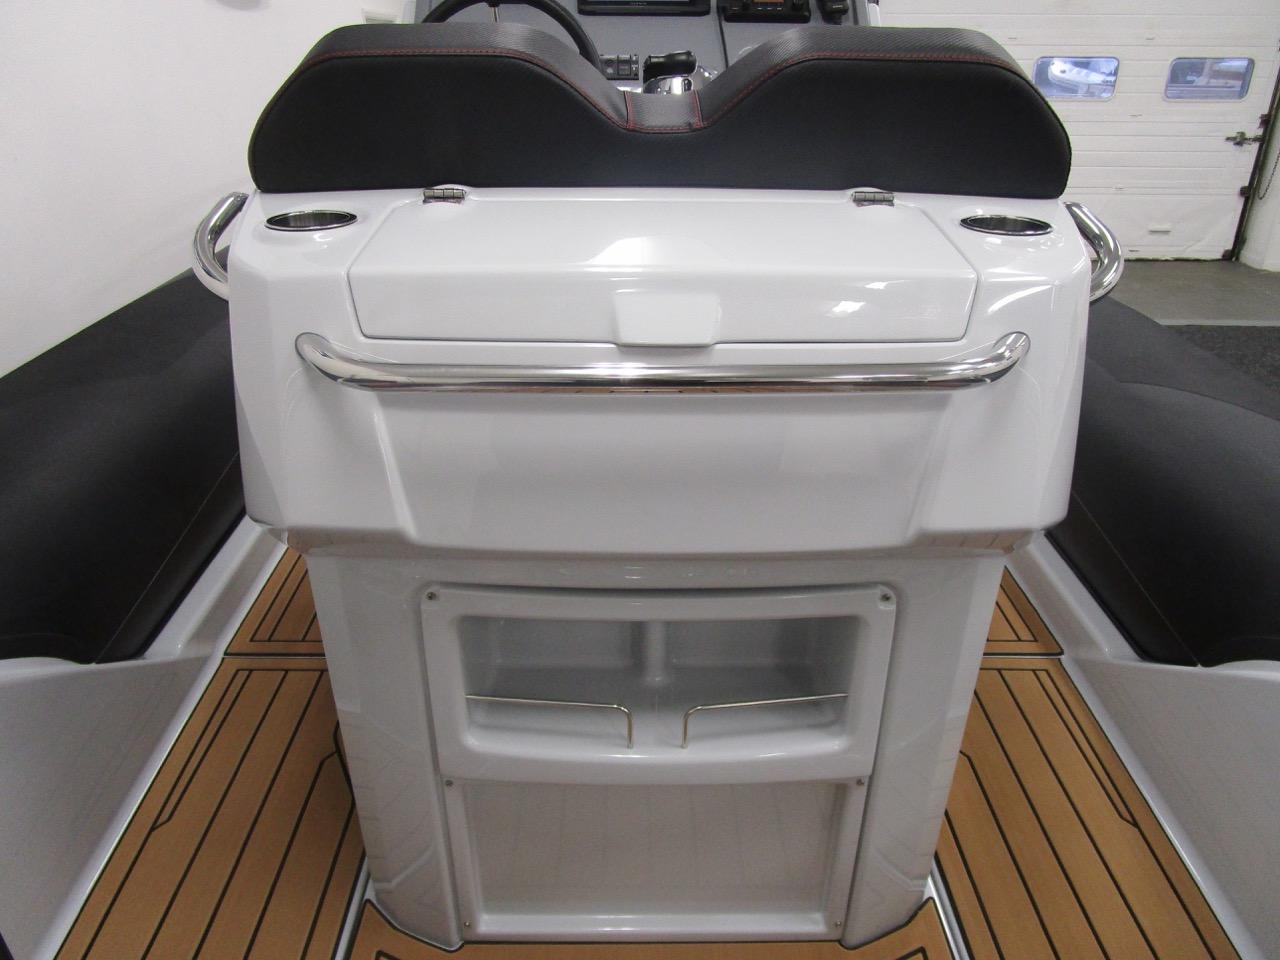 GRAND G750 RIB helm seat back